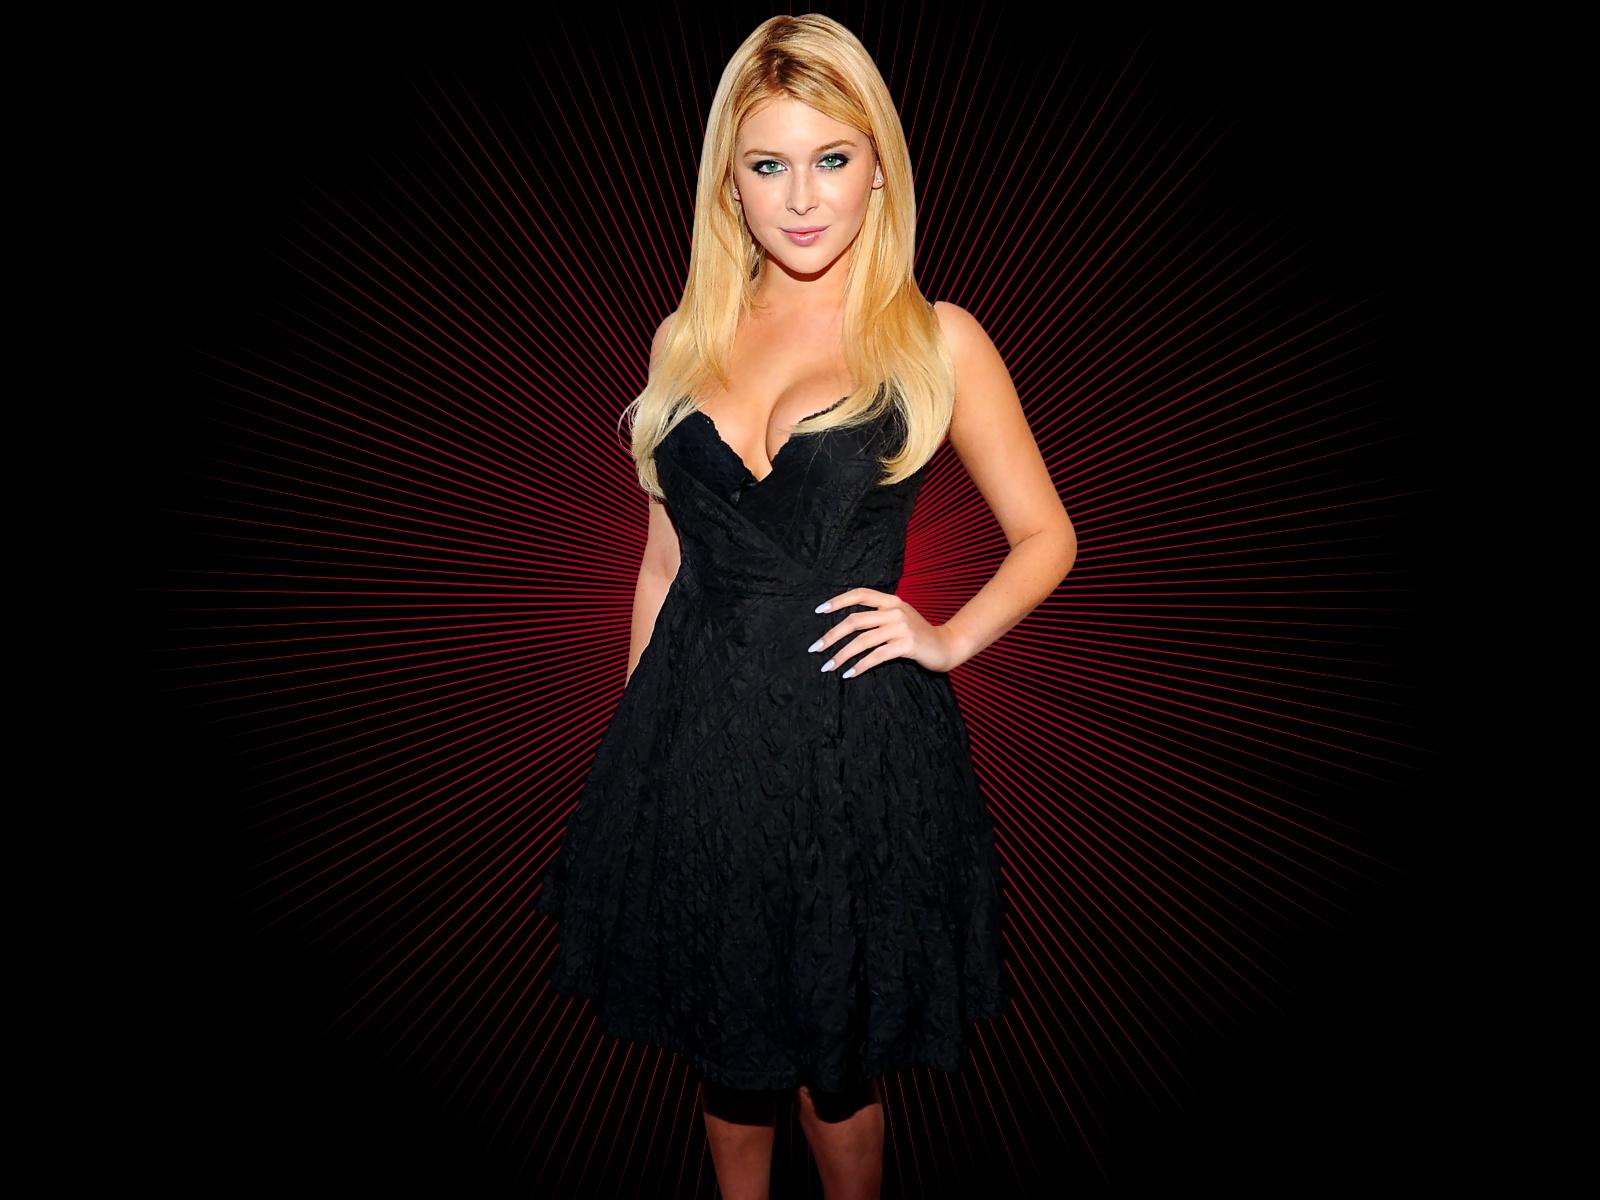 Cara Delevingne Hot Photoshoot, HD Celebrities, 4k